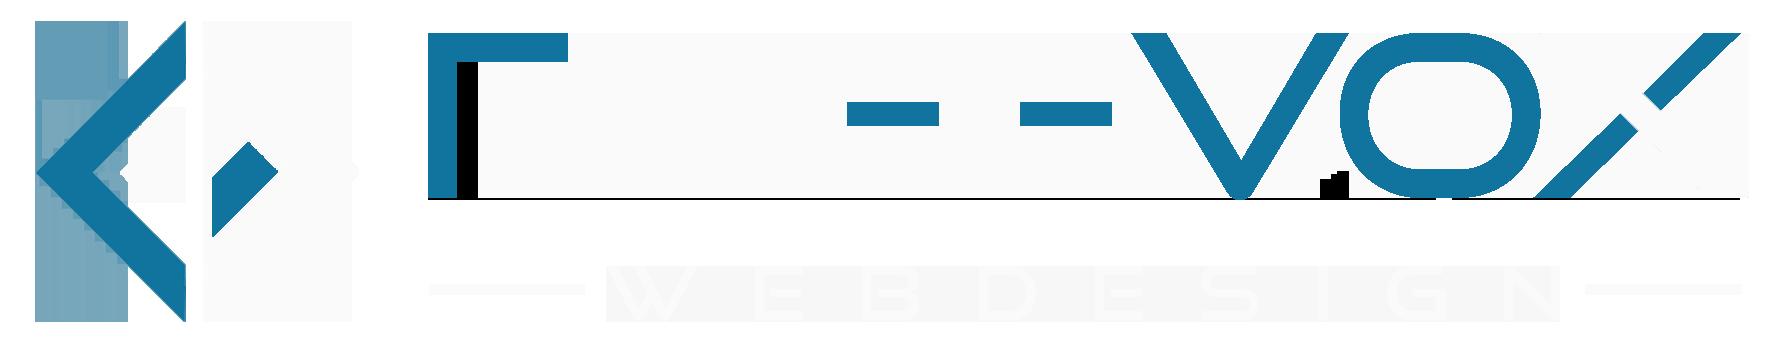 Freevox-webdesign-servicii-web